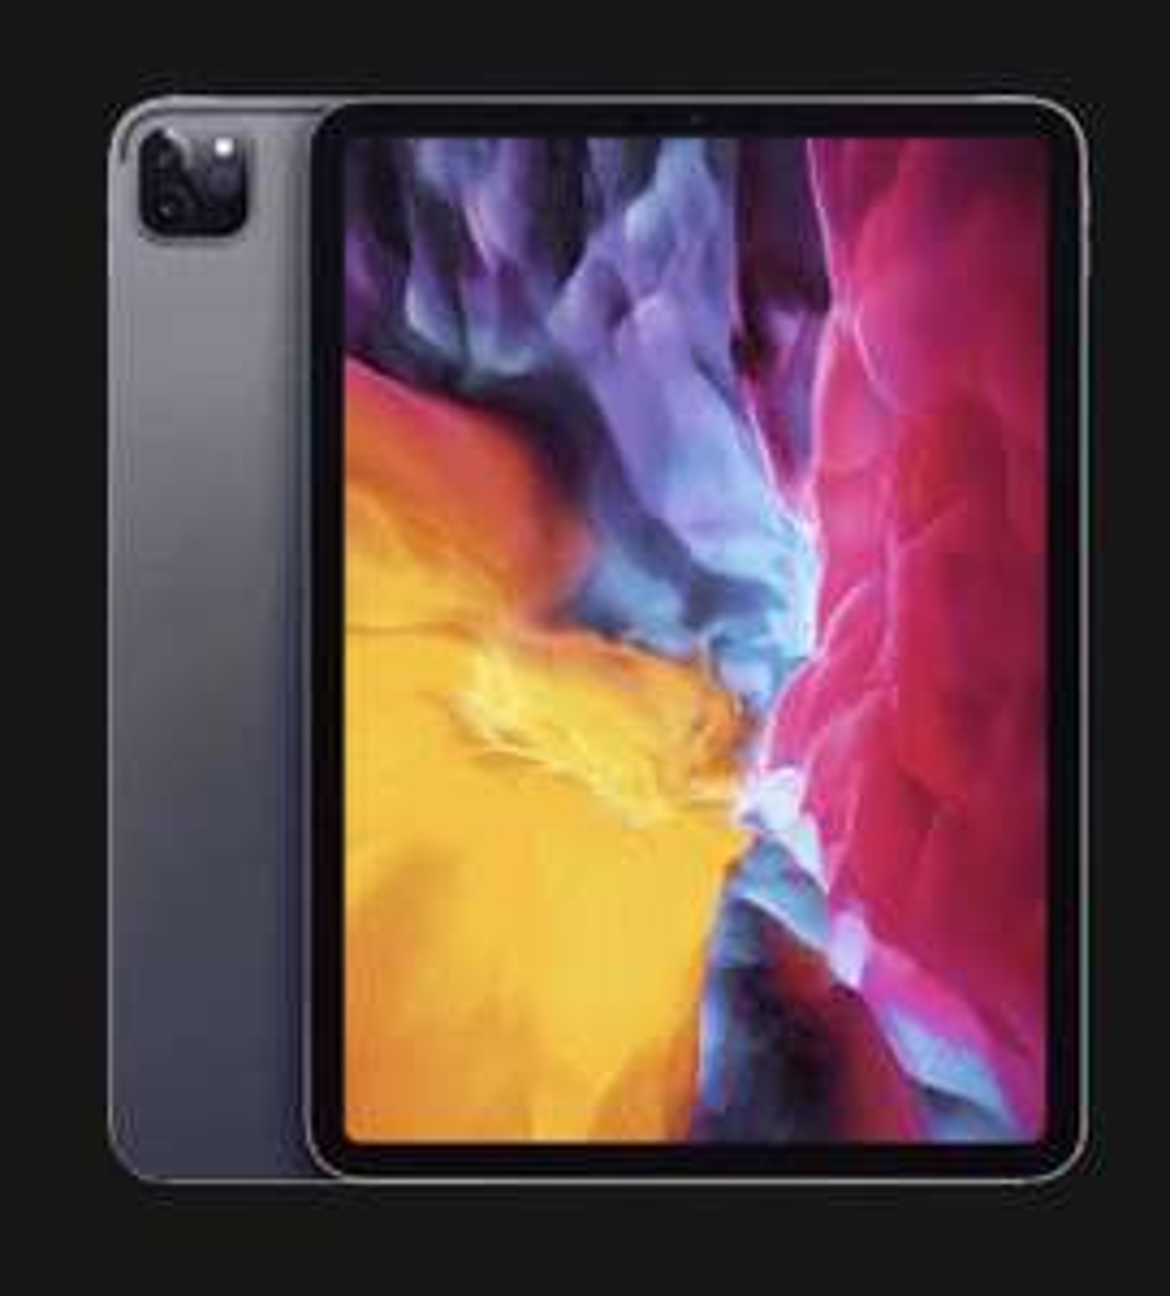 "Apple iPad Pro 11"" 2020 - WiFi - 256GB - MXDC2FDA"